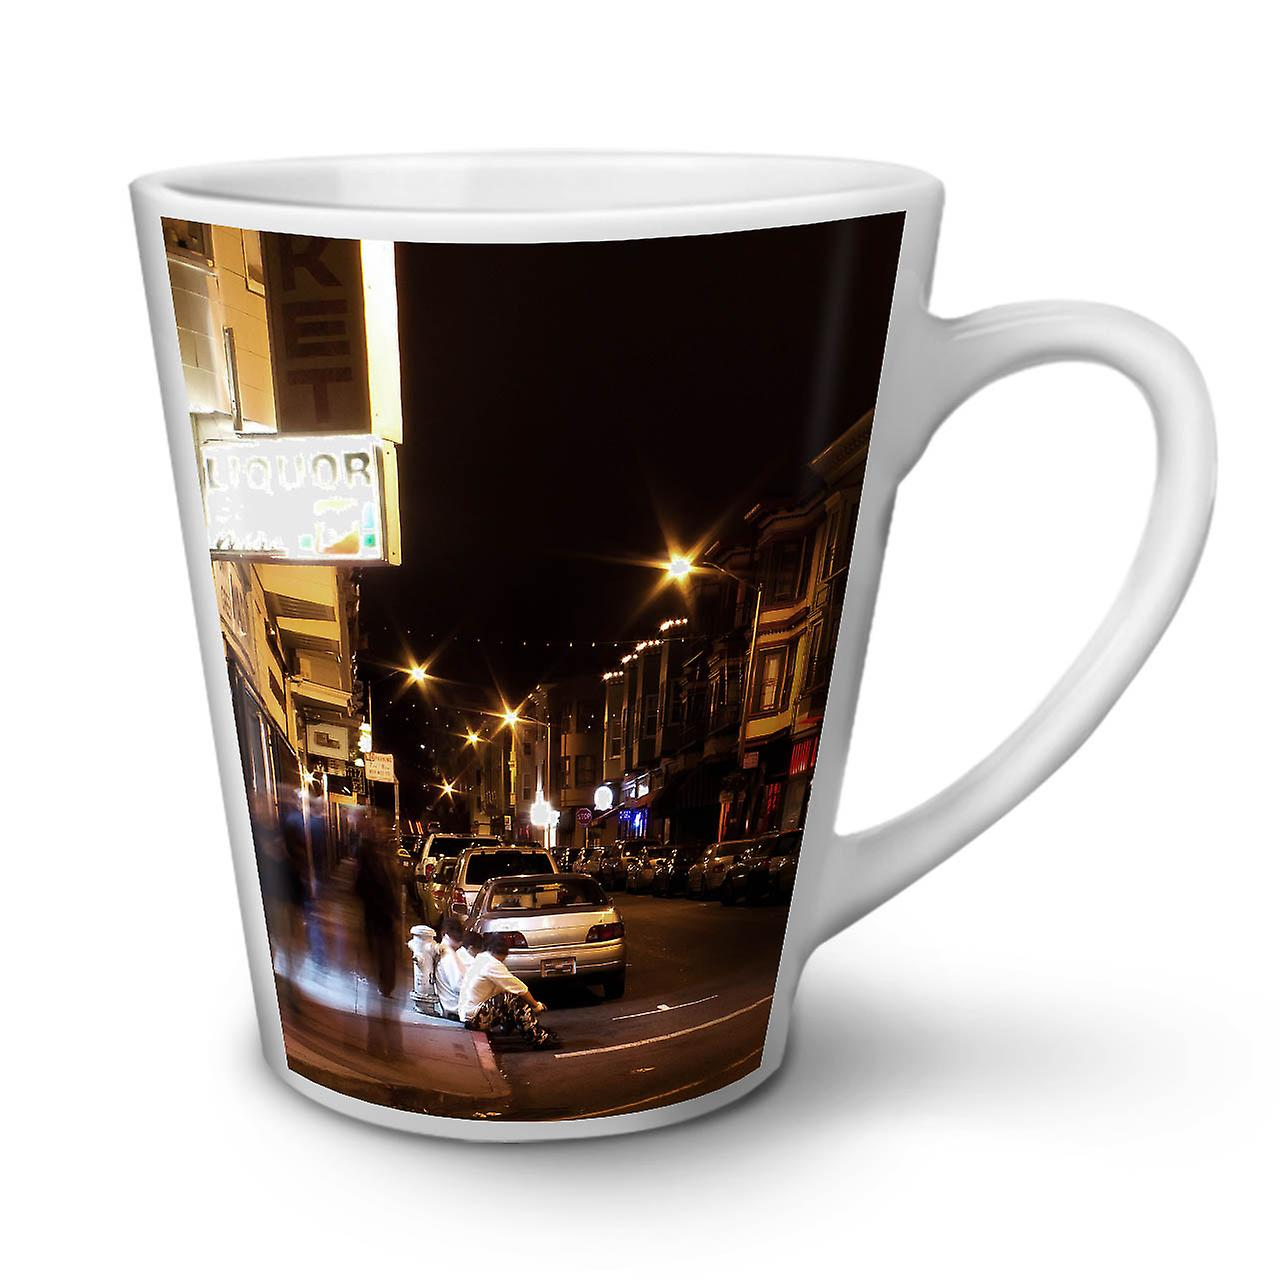 Life Mug Café Night Nouveau Thé City Latte En Céramique Blanc 12 OzWellcoda Street 1JlcuF3KT